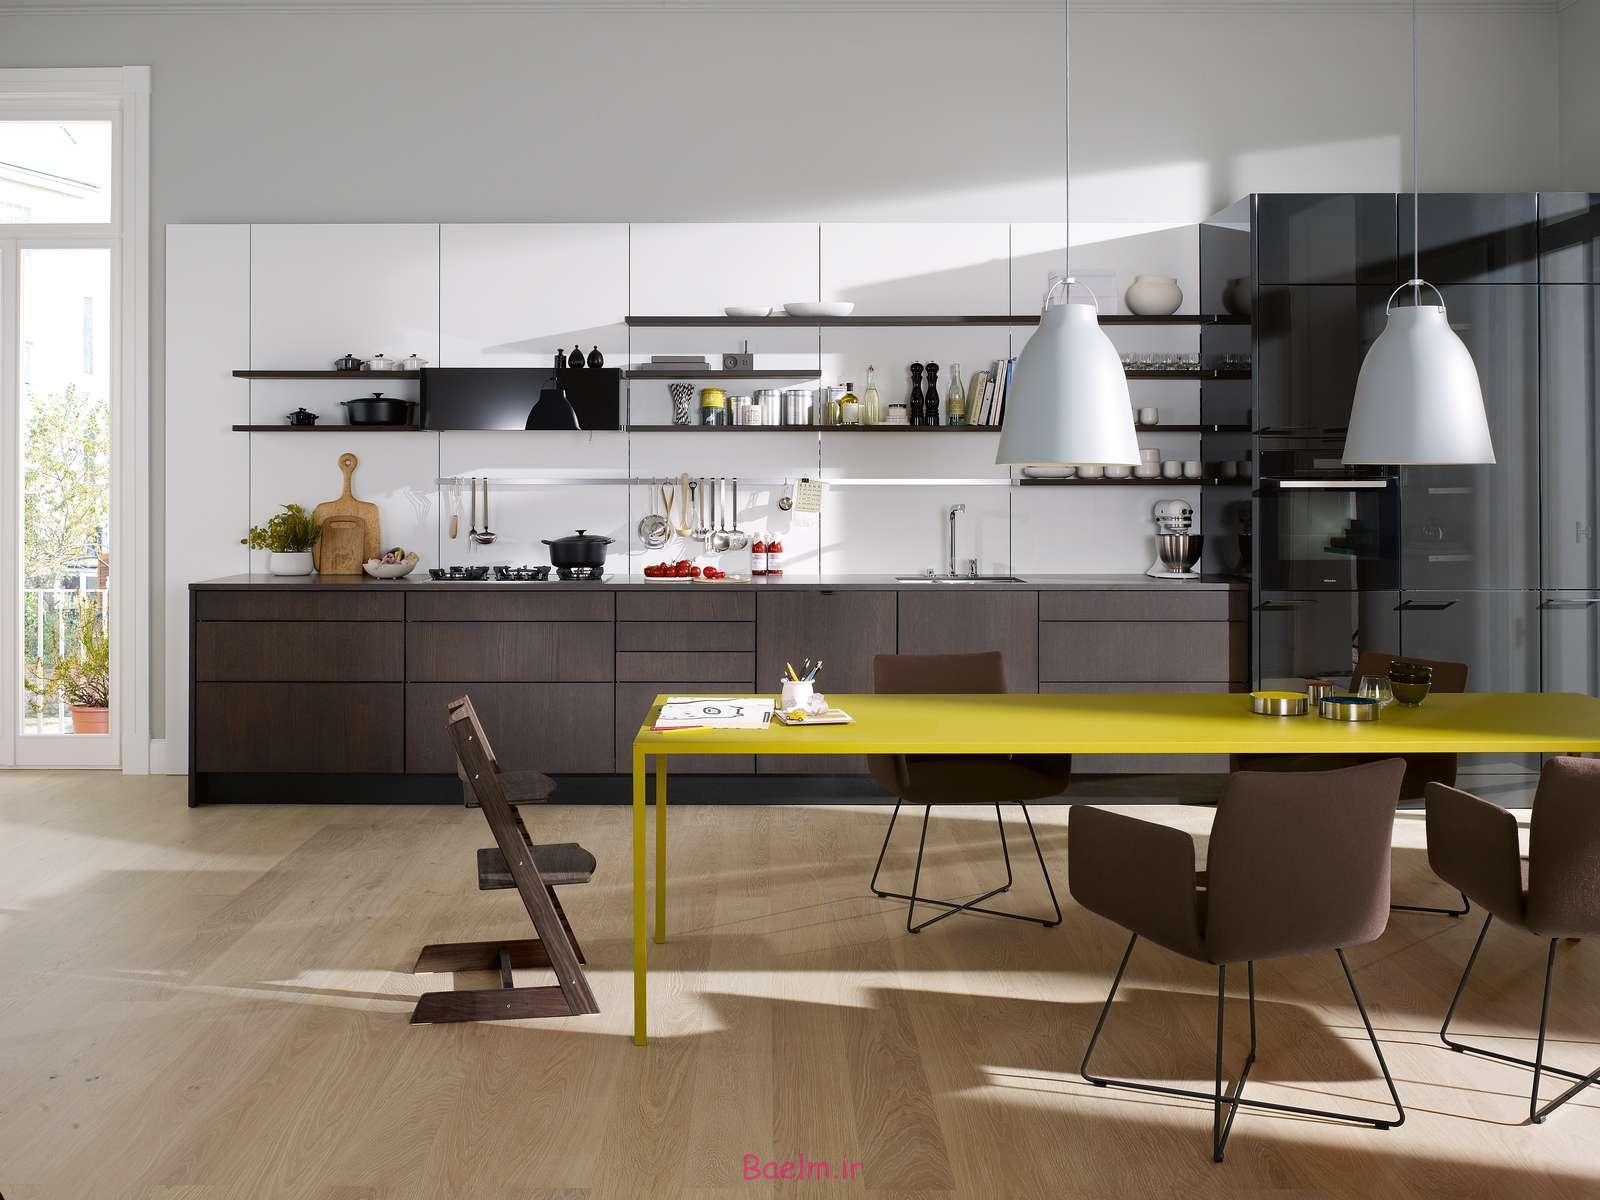 kitchen design ideas 4 Kitchen Design Ideas